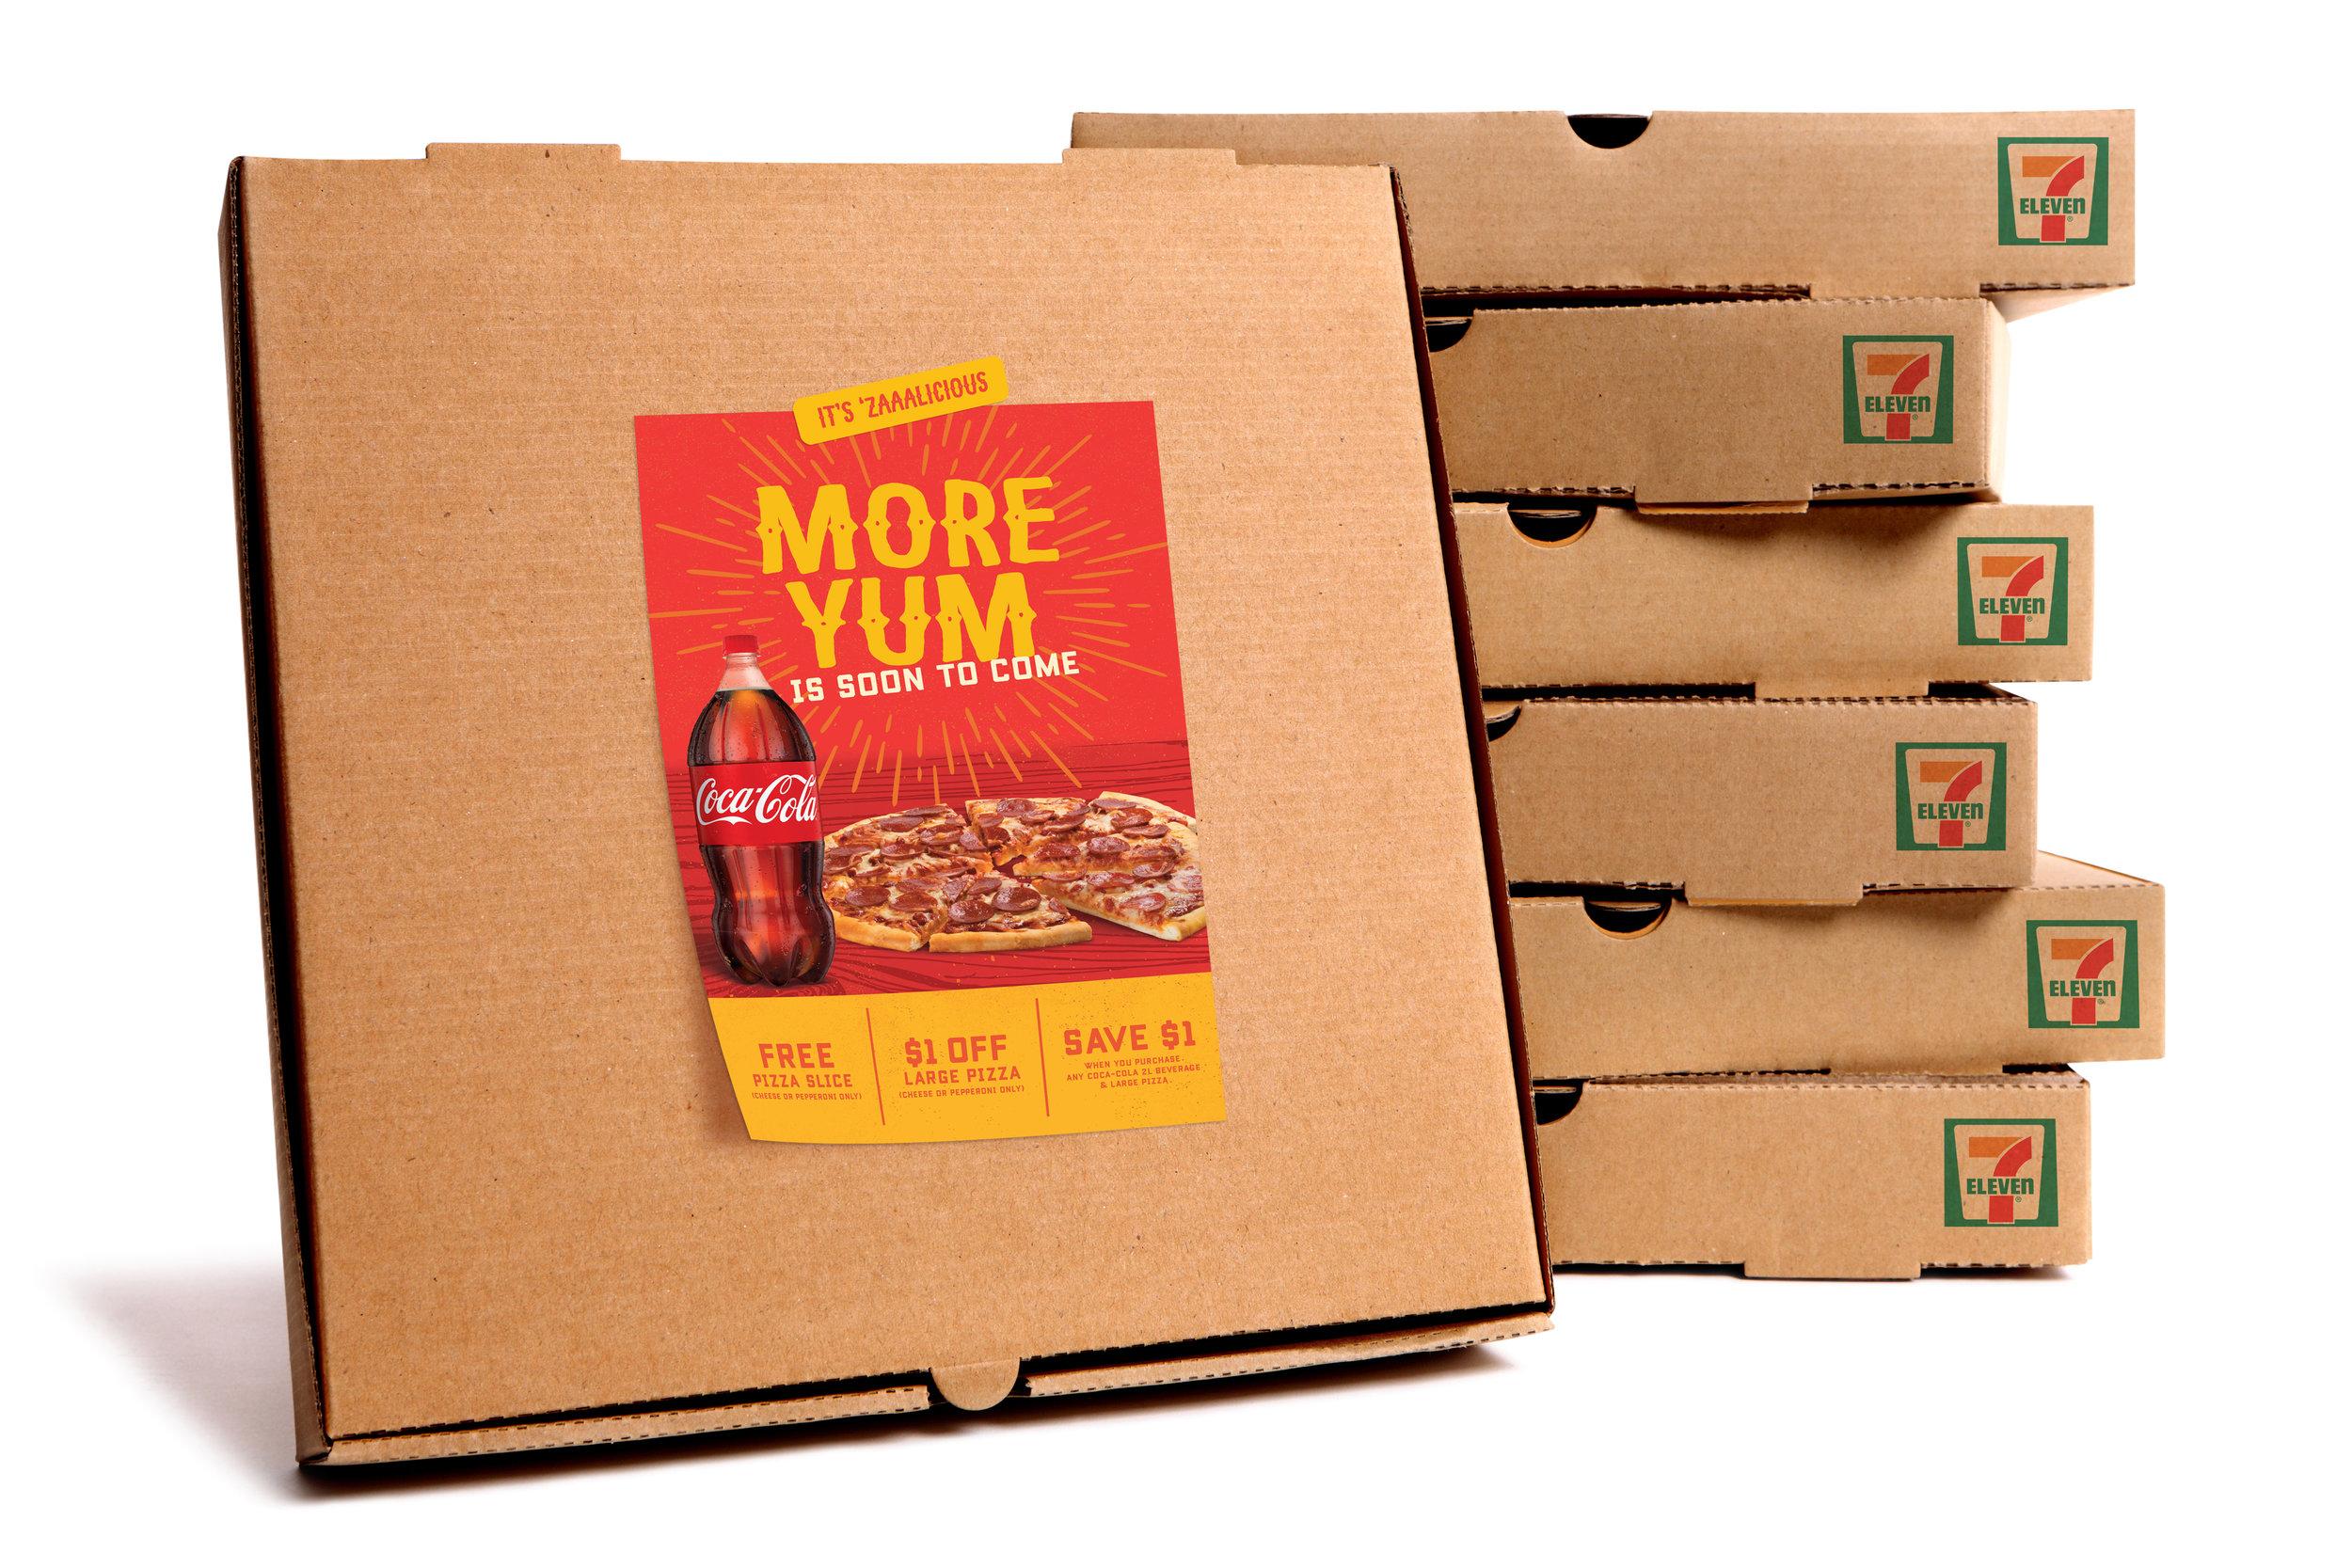 Pizza_box_logos.jpg